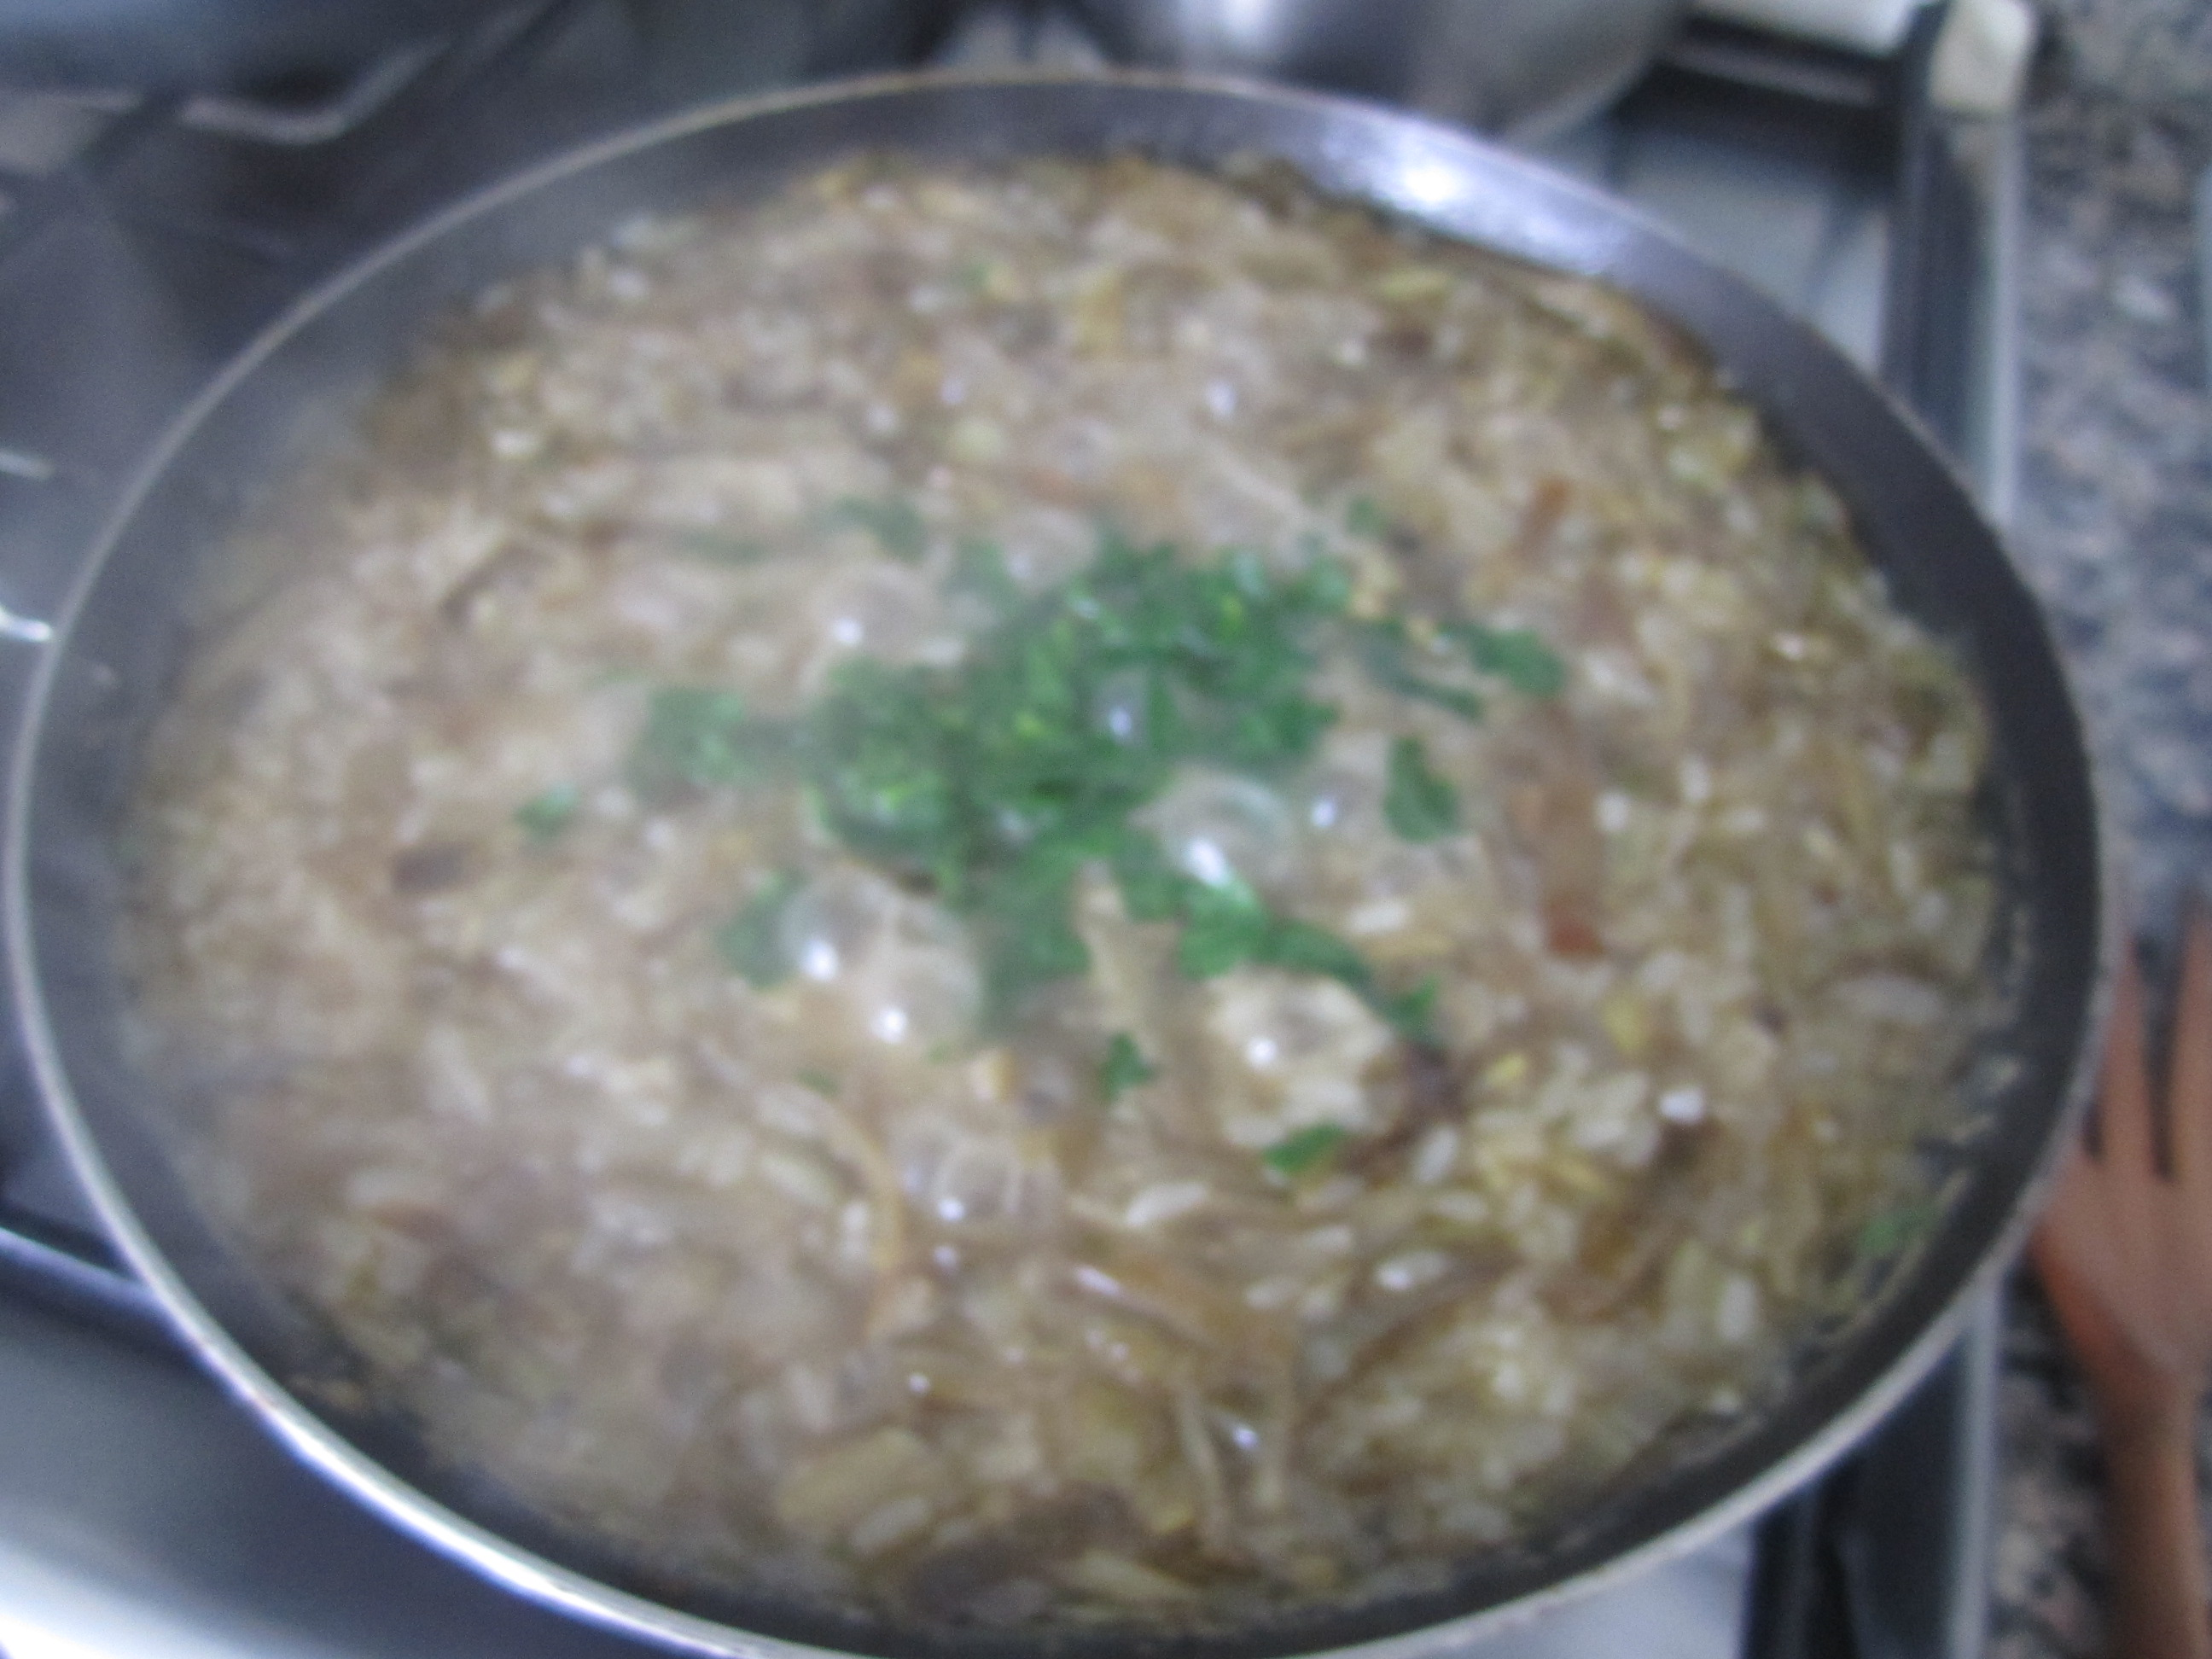 Img 0928 la cucina di loredana - Loredana in cucina ...